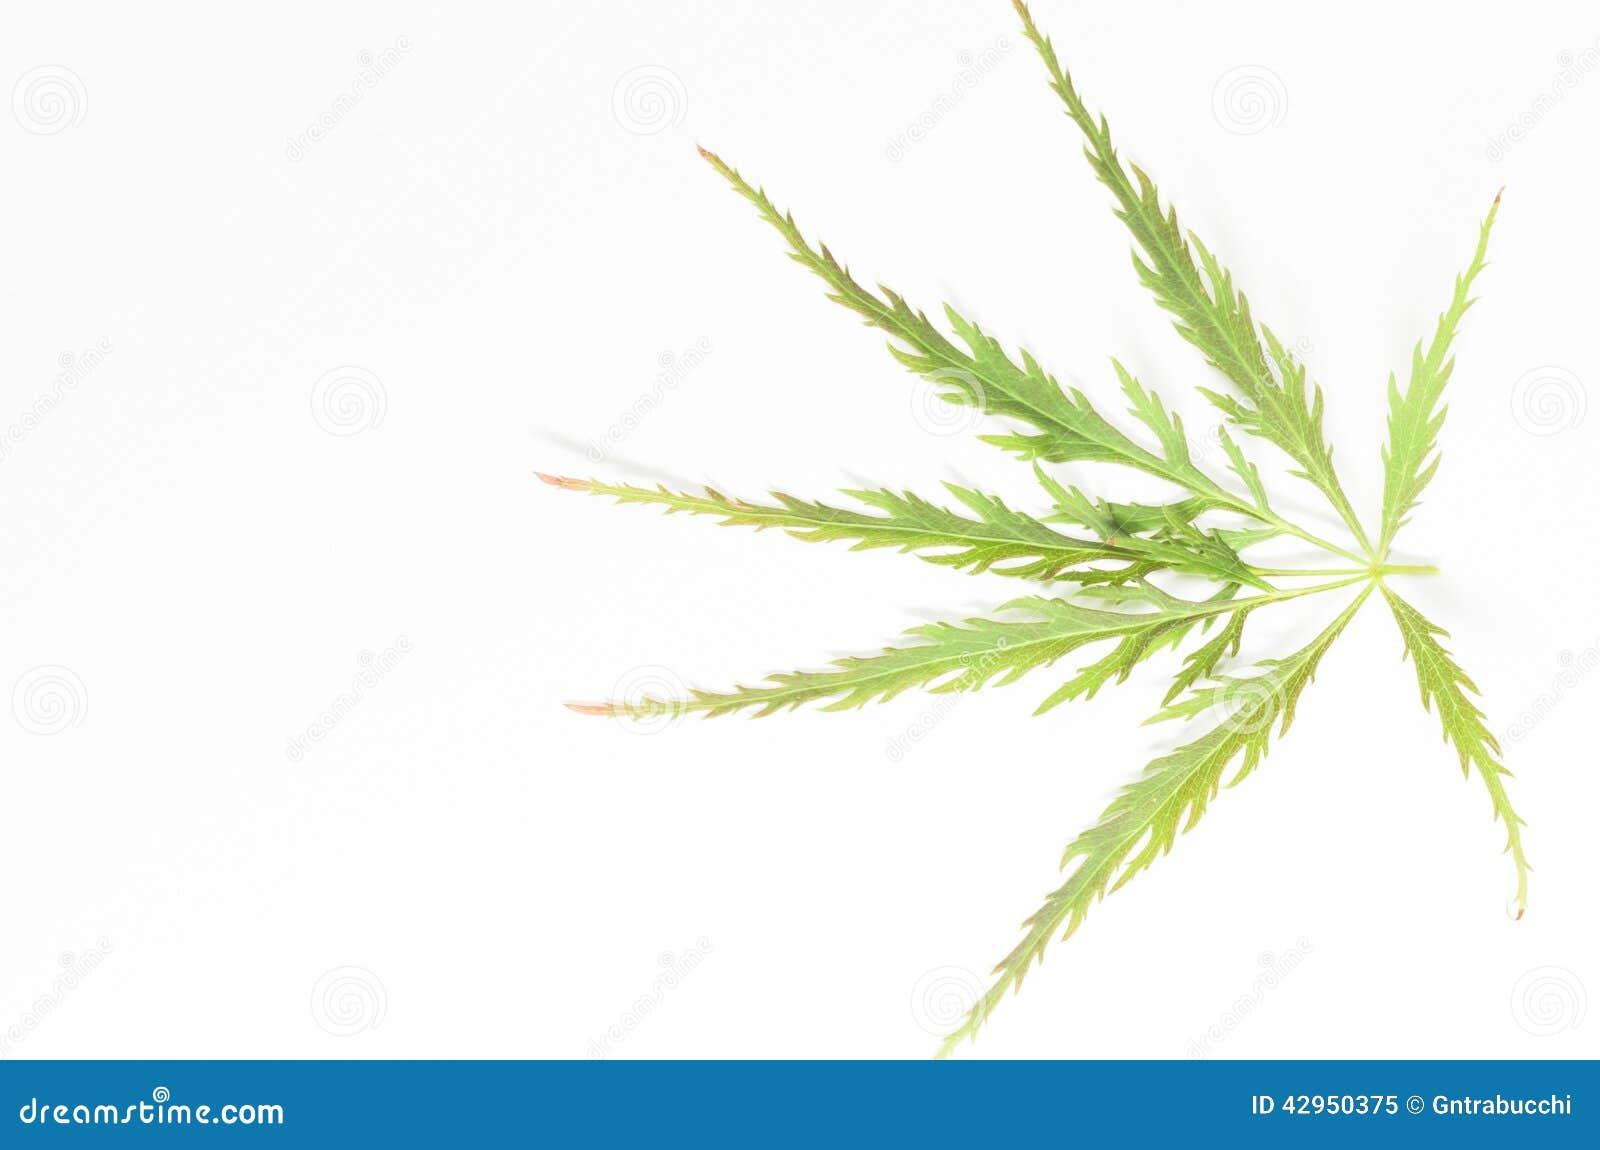 Download Japanese Maple Leaf On A Light Paper Background Stock Image - Image of leaf, background: 42950375